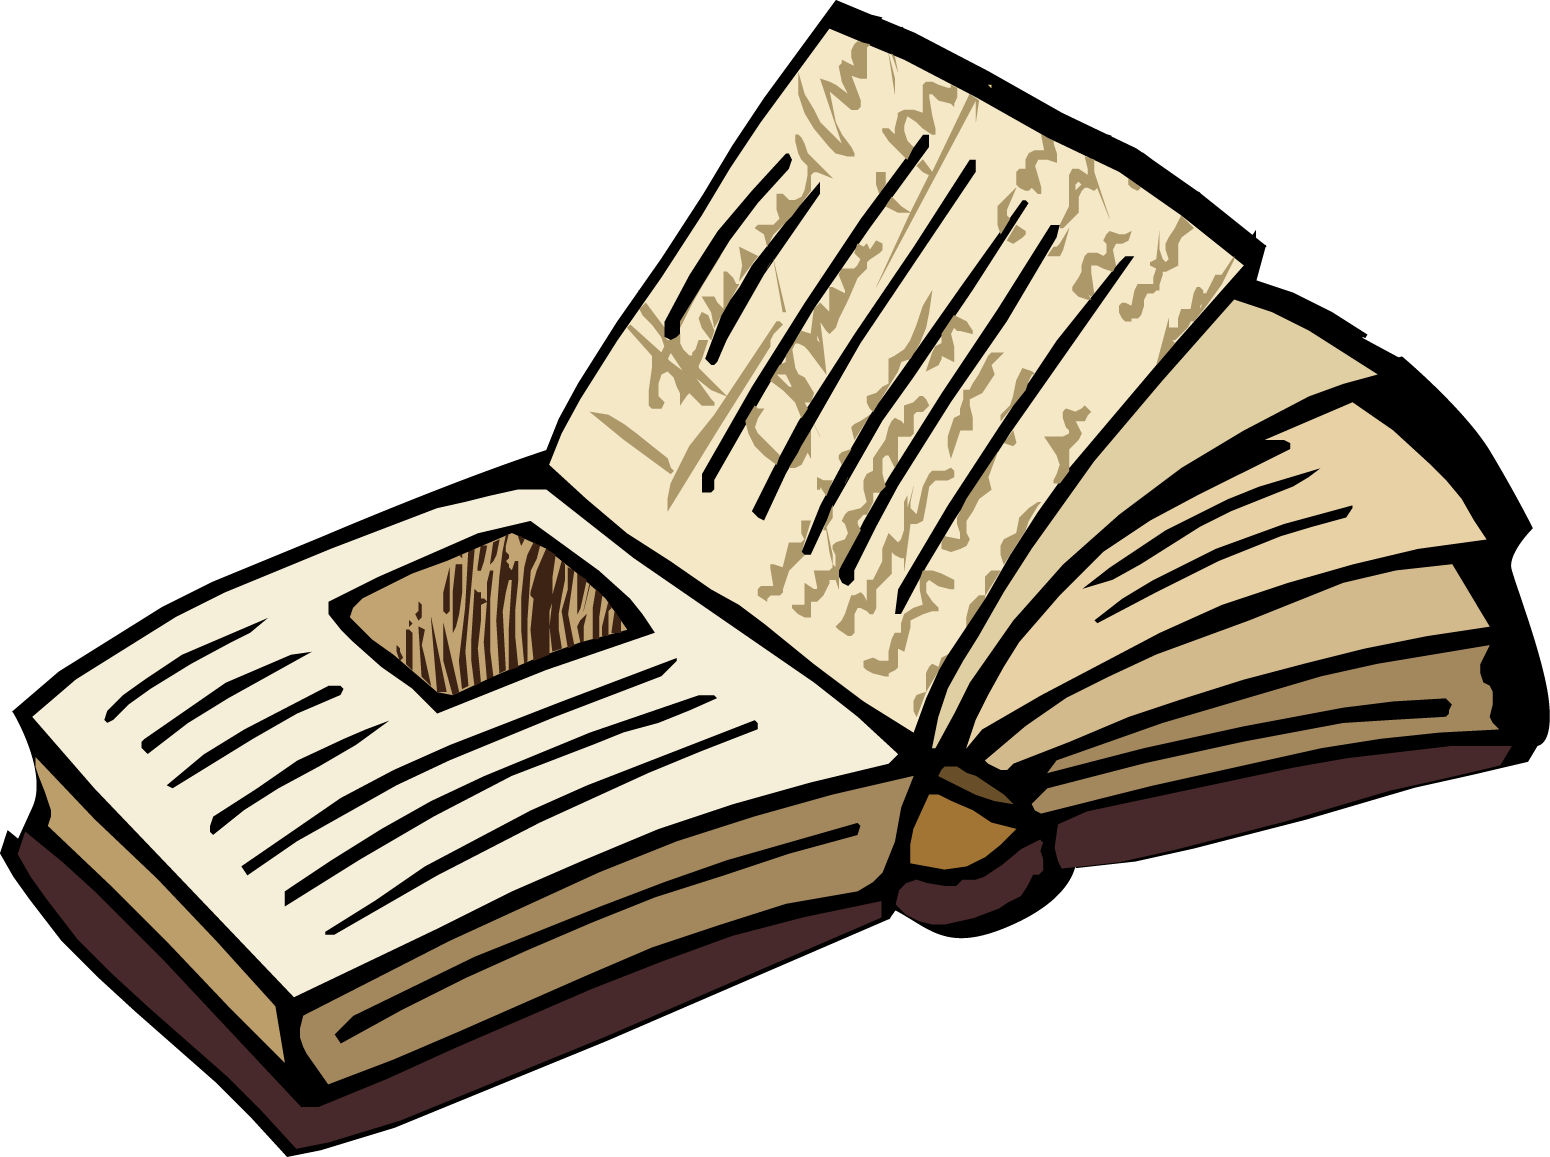 Imagini pentru book png